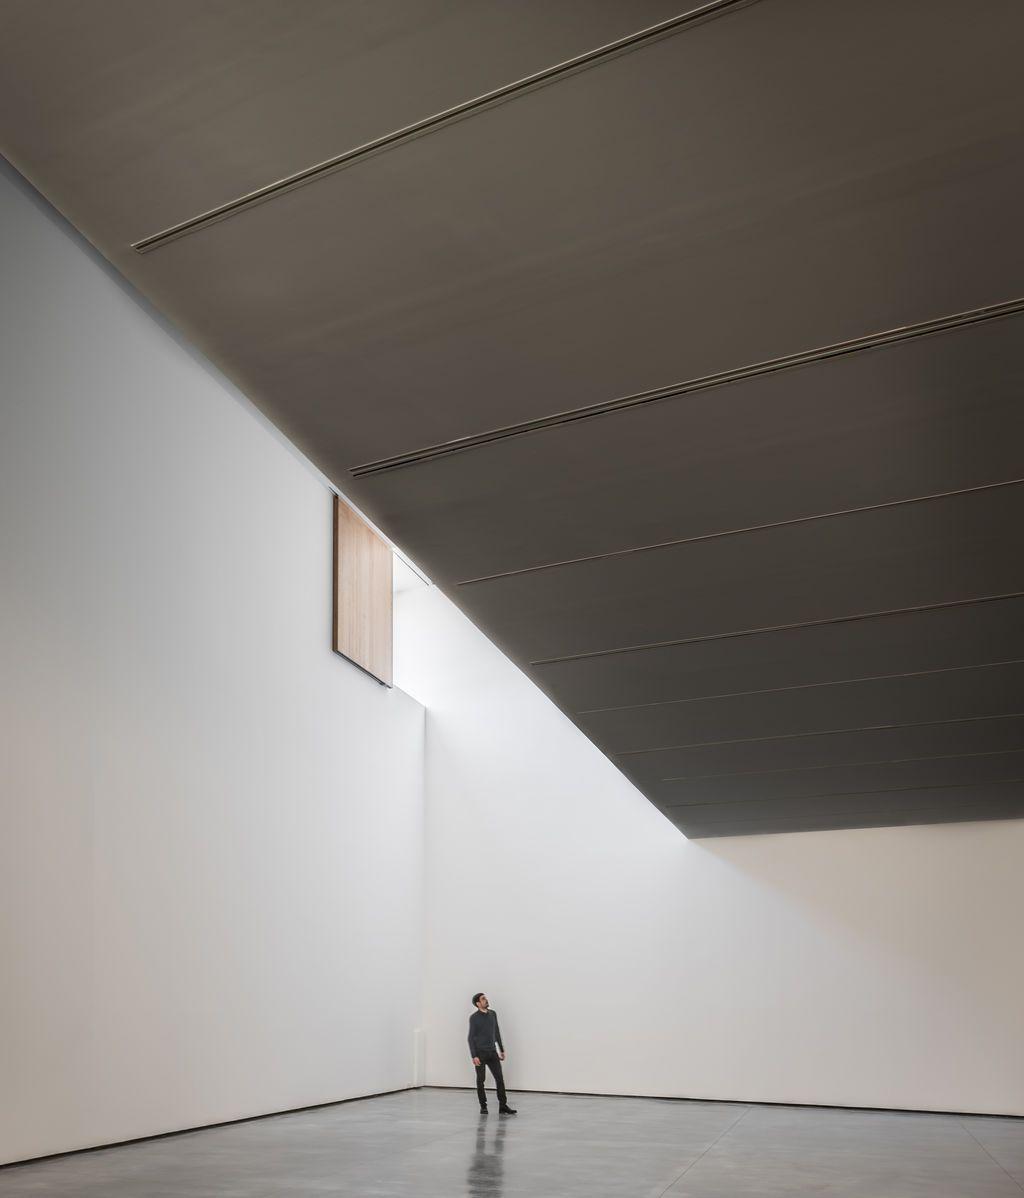 Vista del interior del edificio